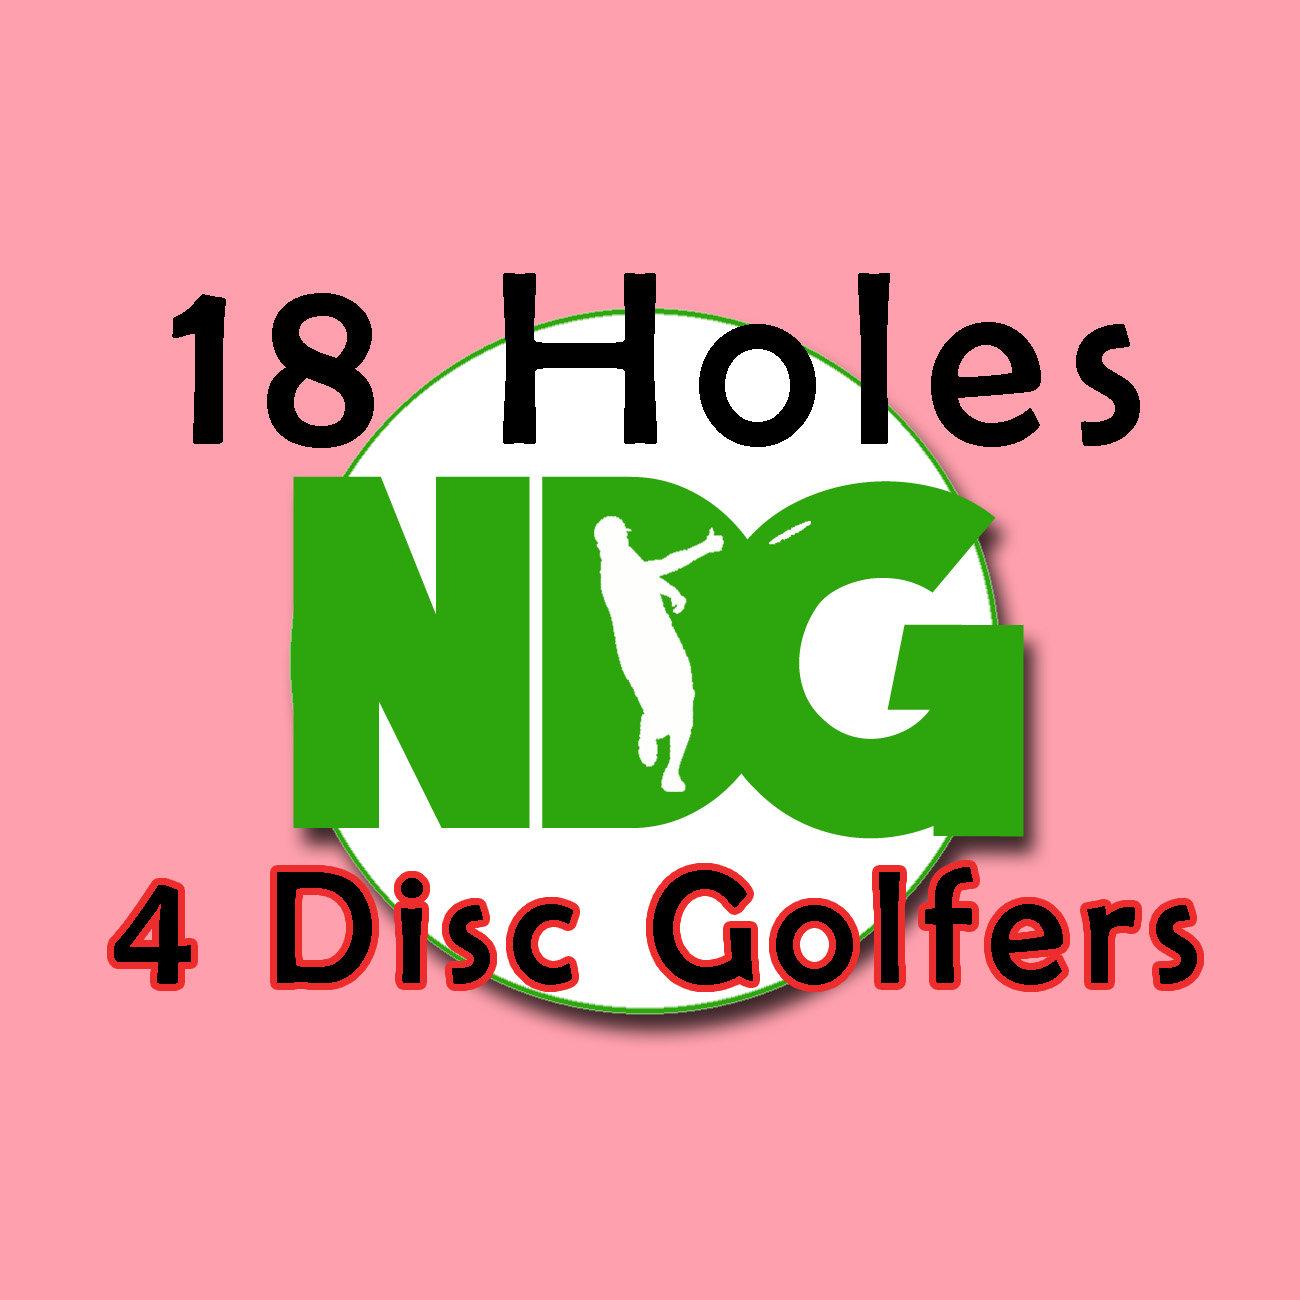 18 Holes: 4 Disc Golfers